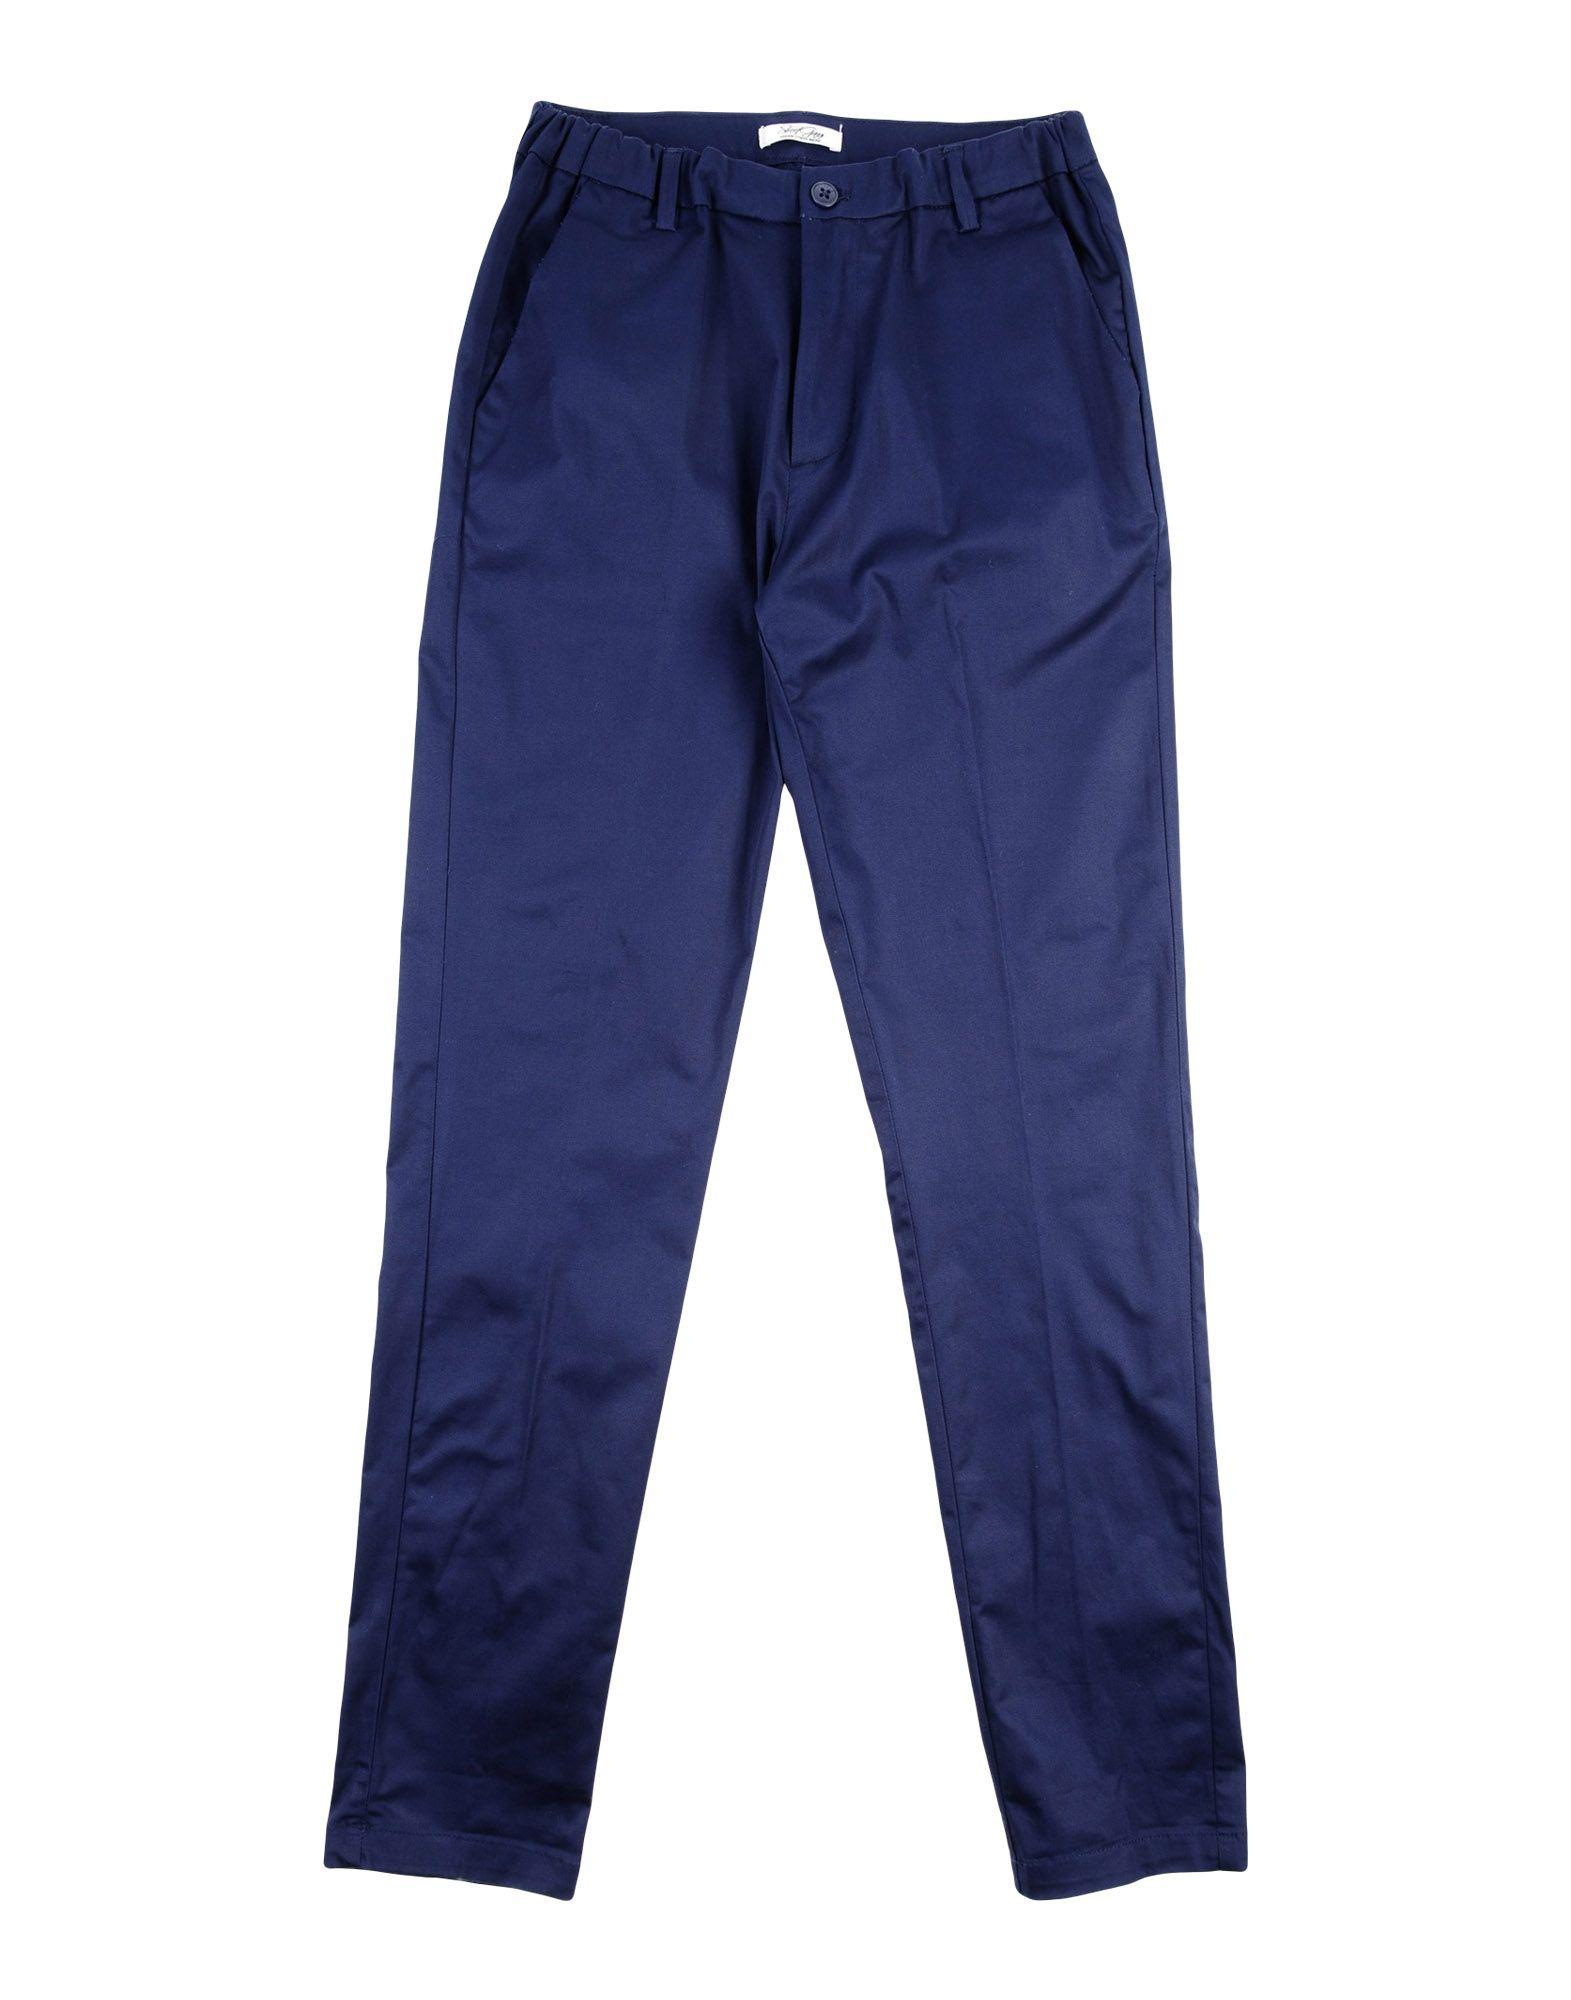 STREET GANG Повседневные брюки street gang куртка для мальчика sg3210 серый street gang